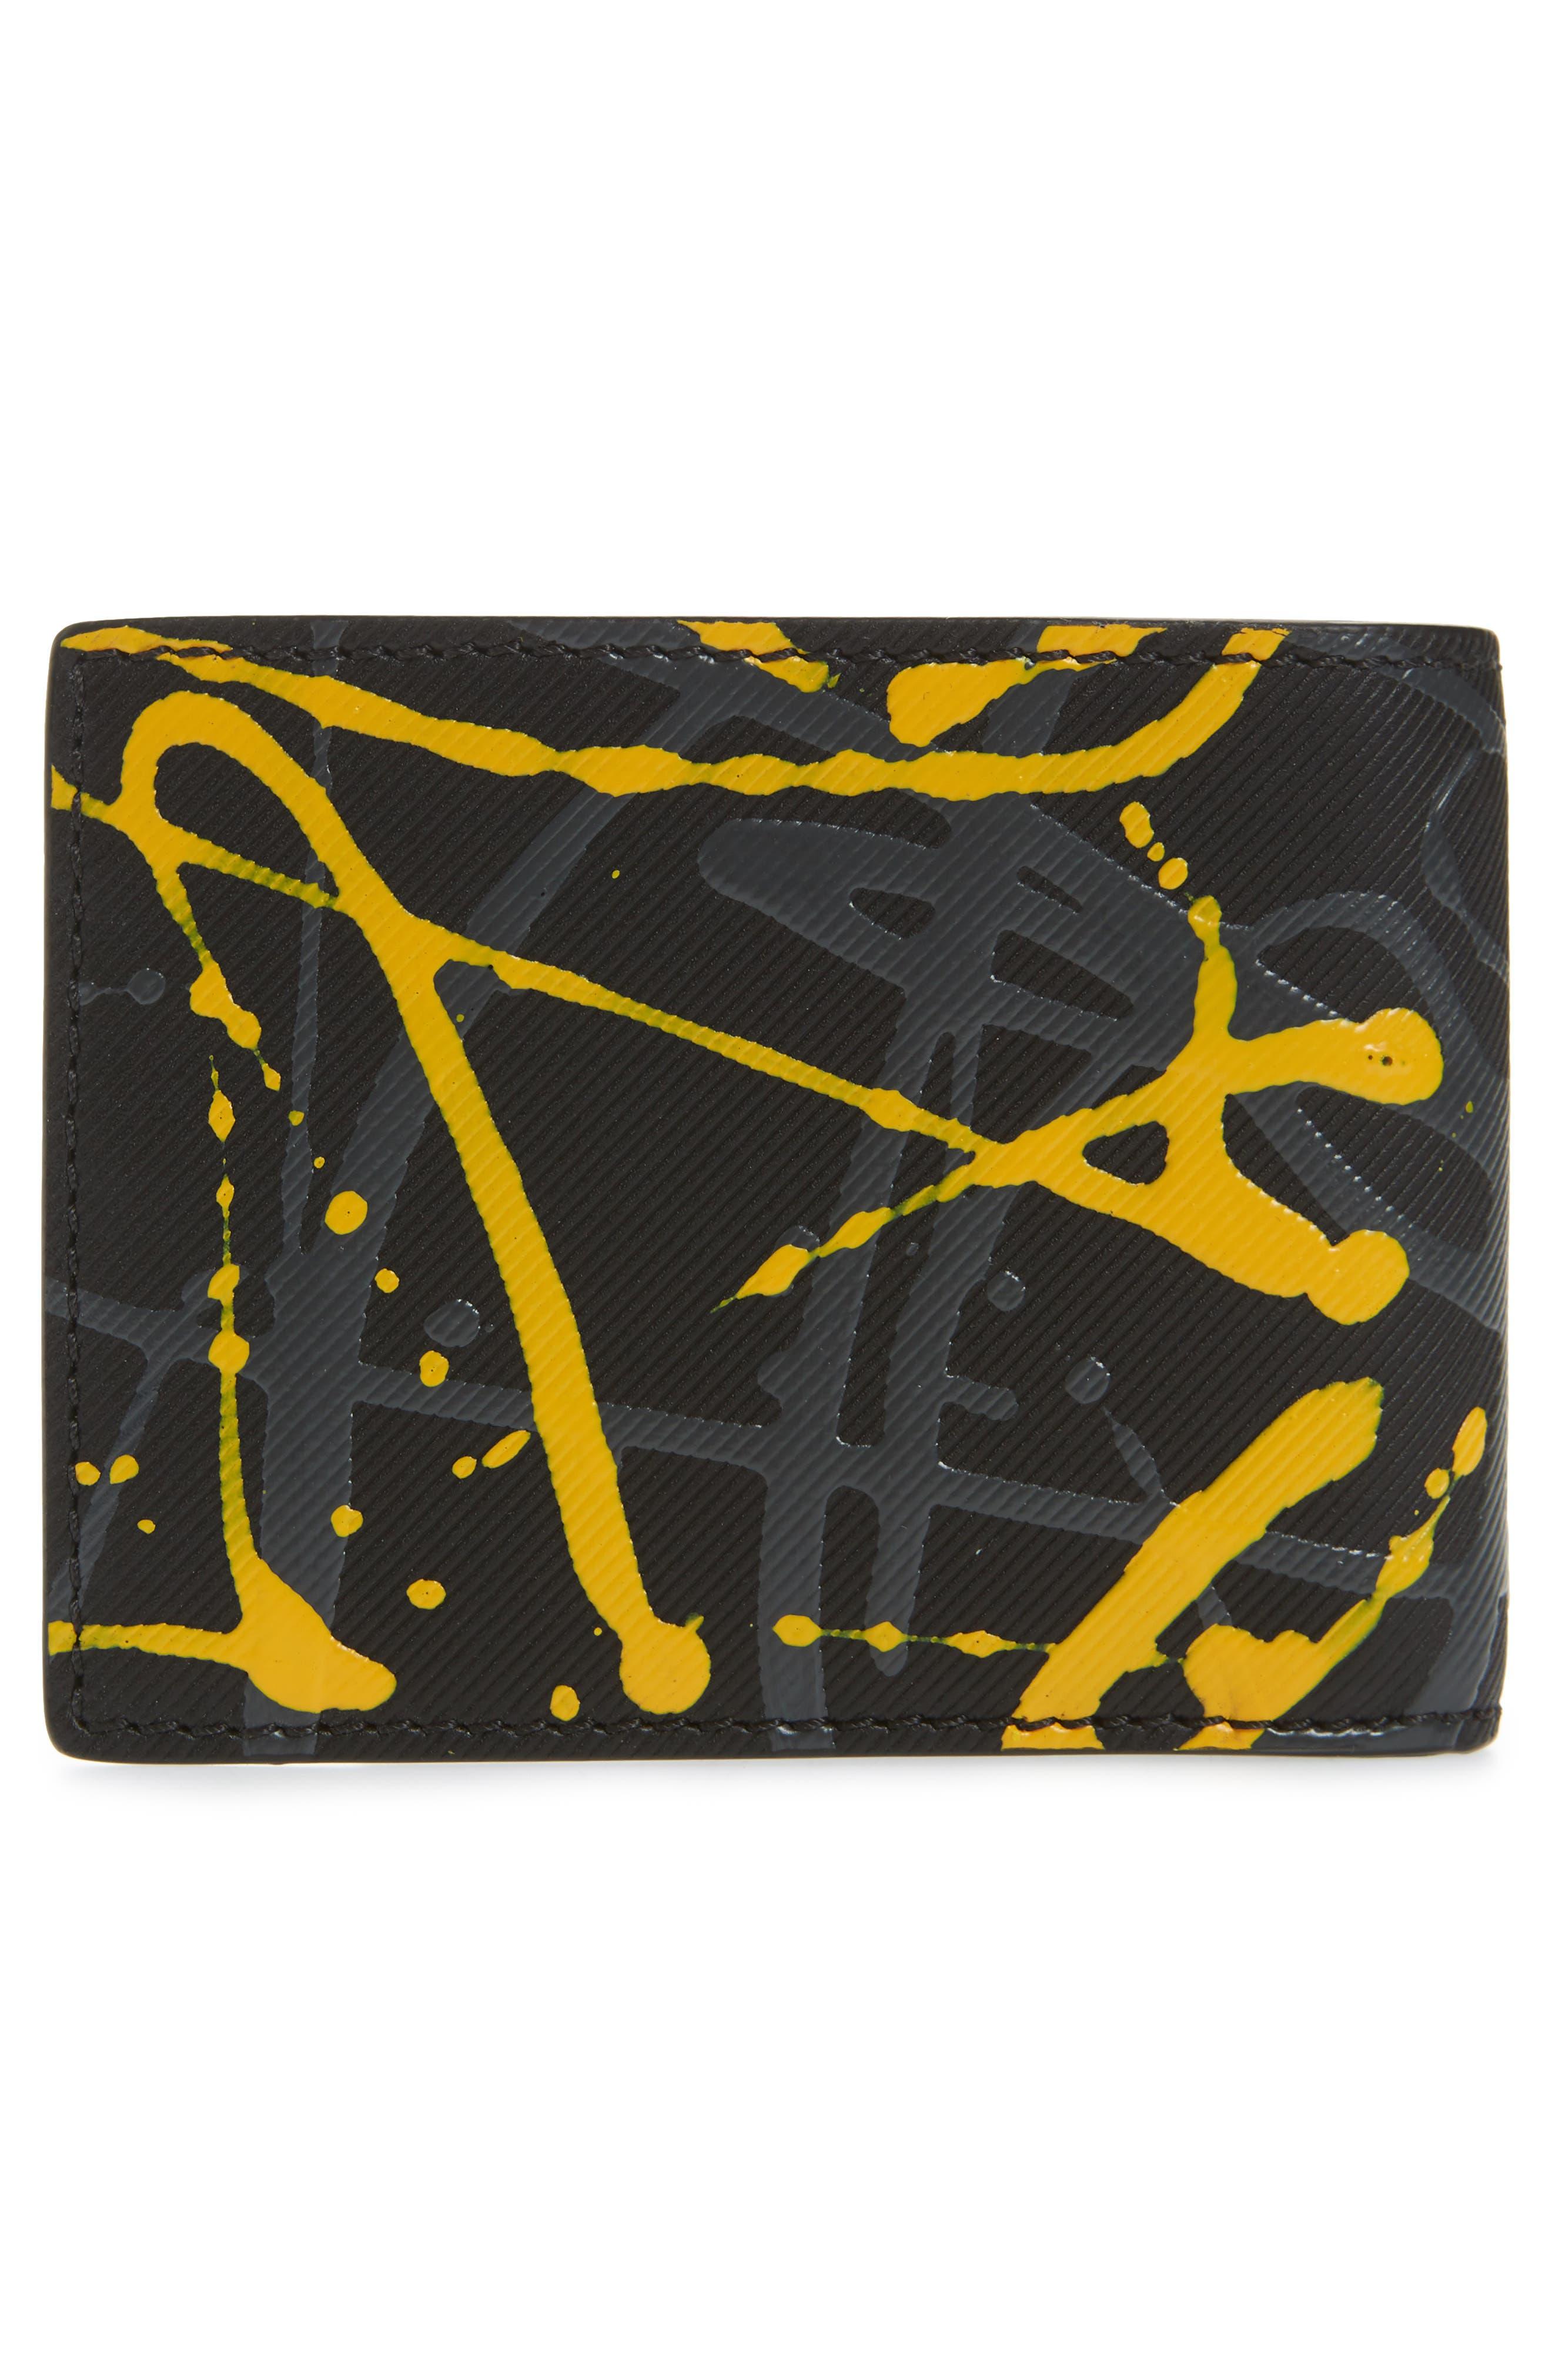 Trench Splash Leather Wallet,                             Alternate thumbnail 2, color,                             Black/ Splash